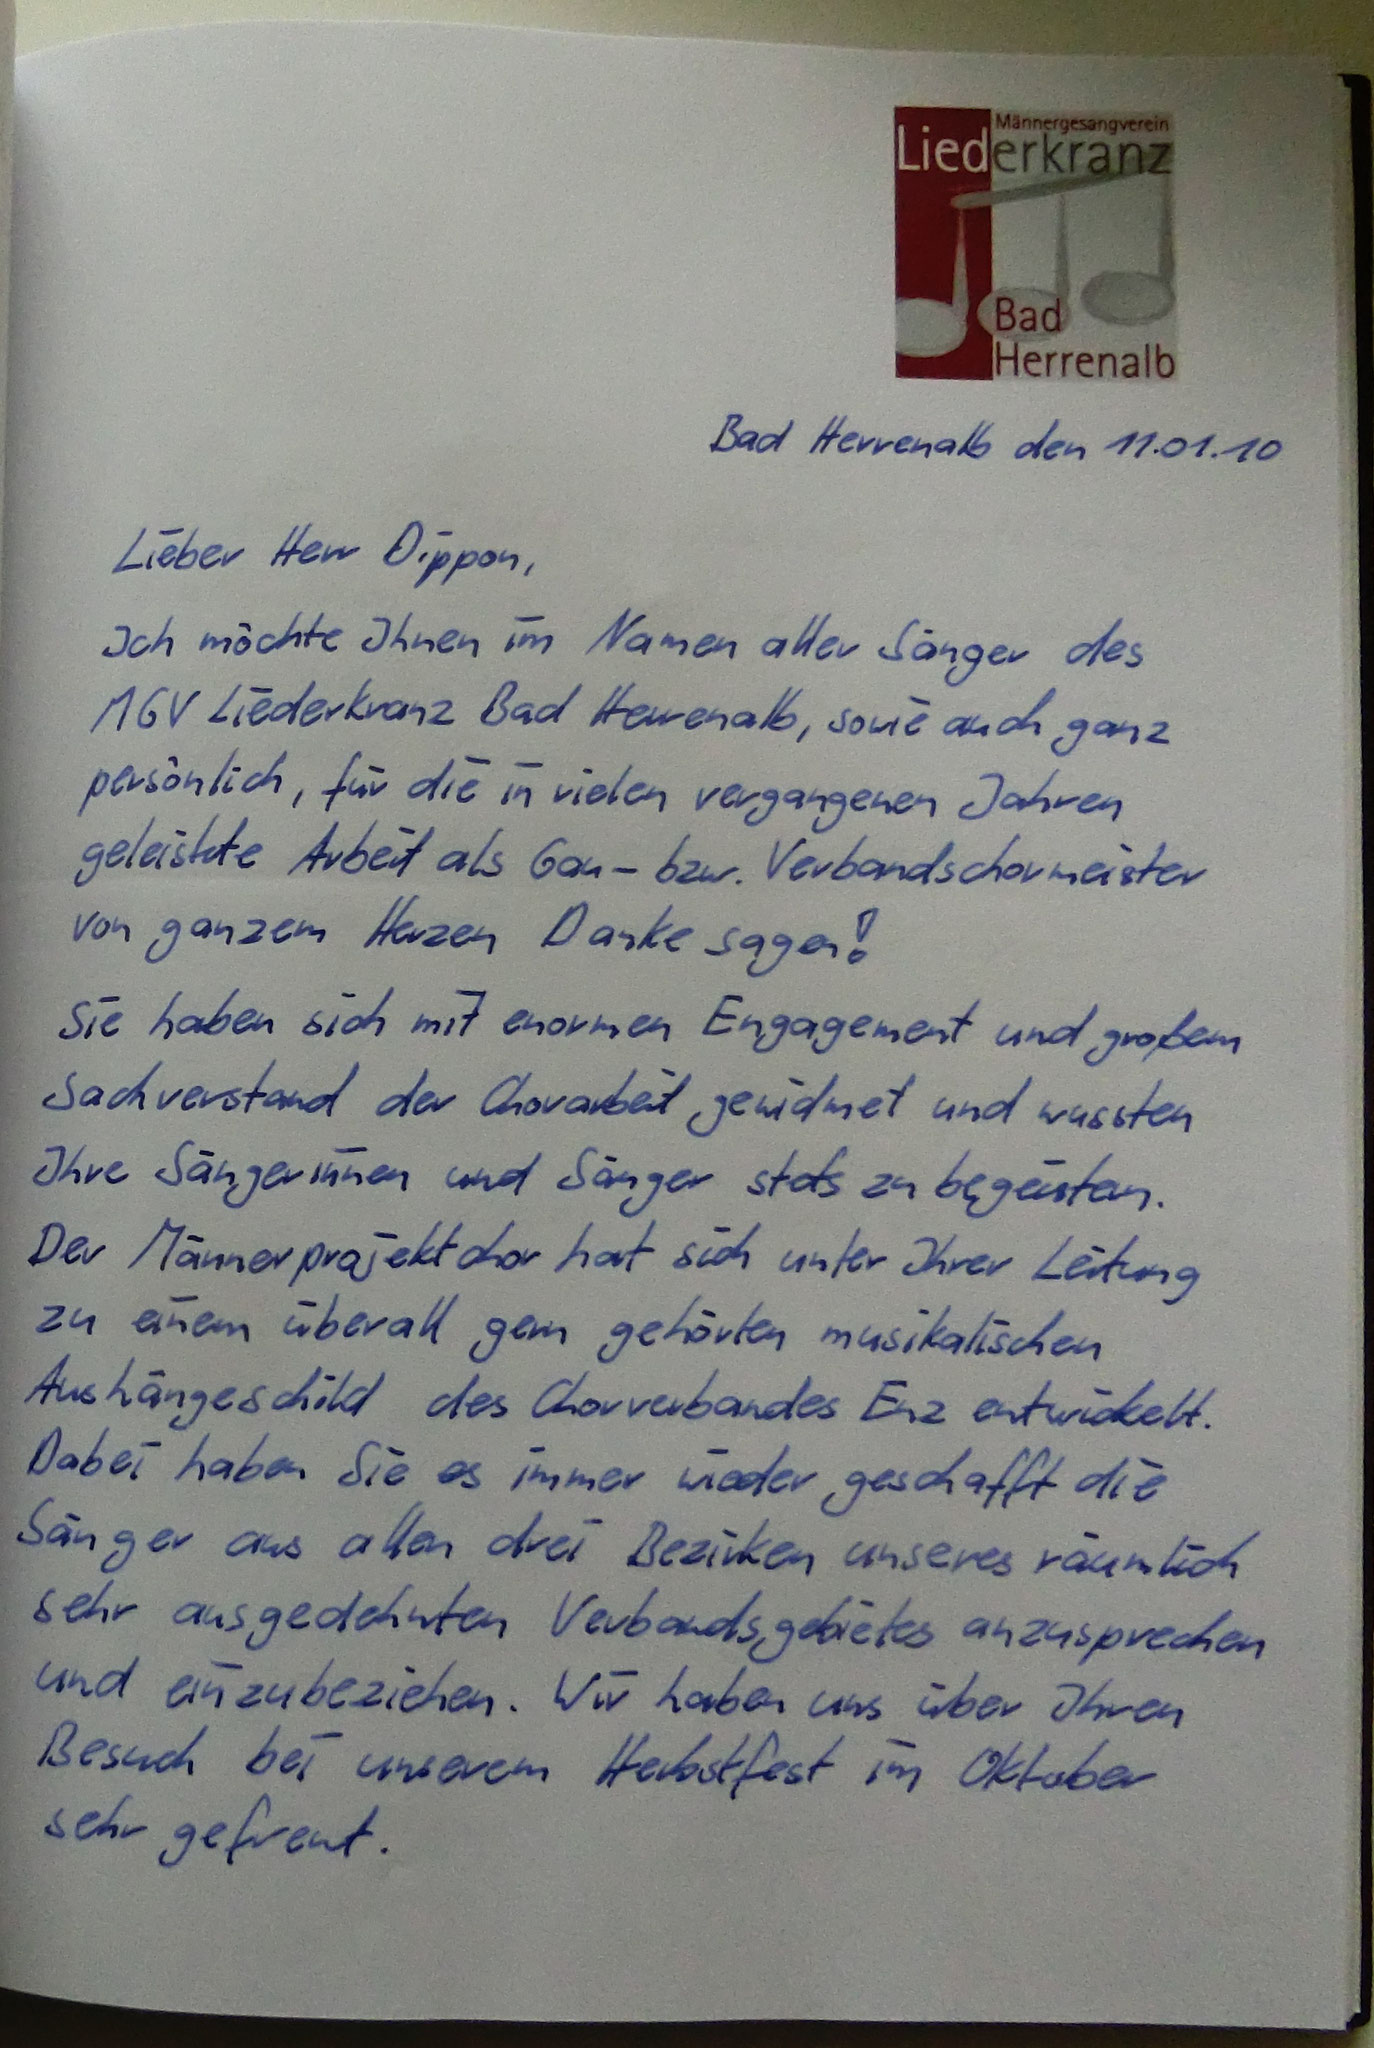 Liederkranz Bad Herrenalb